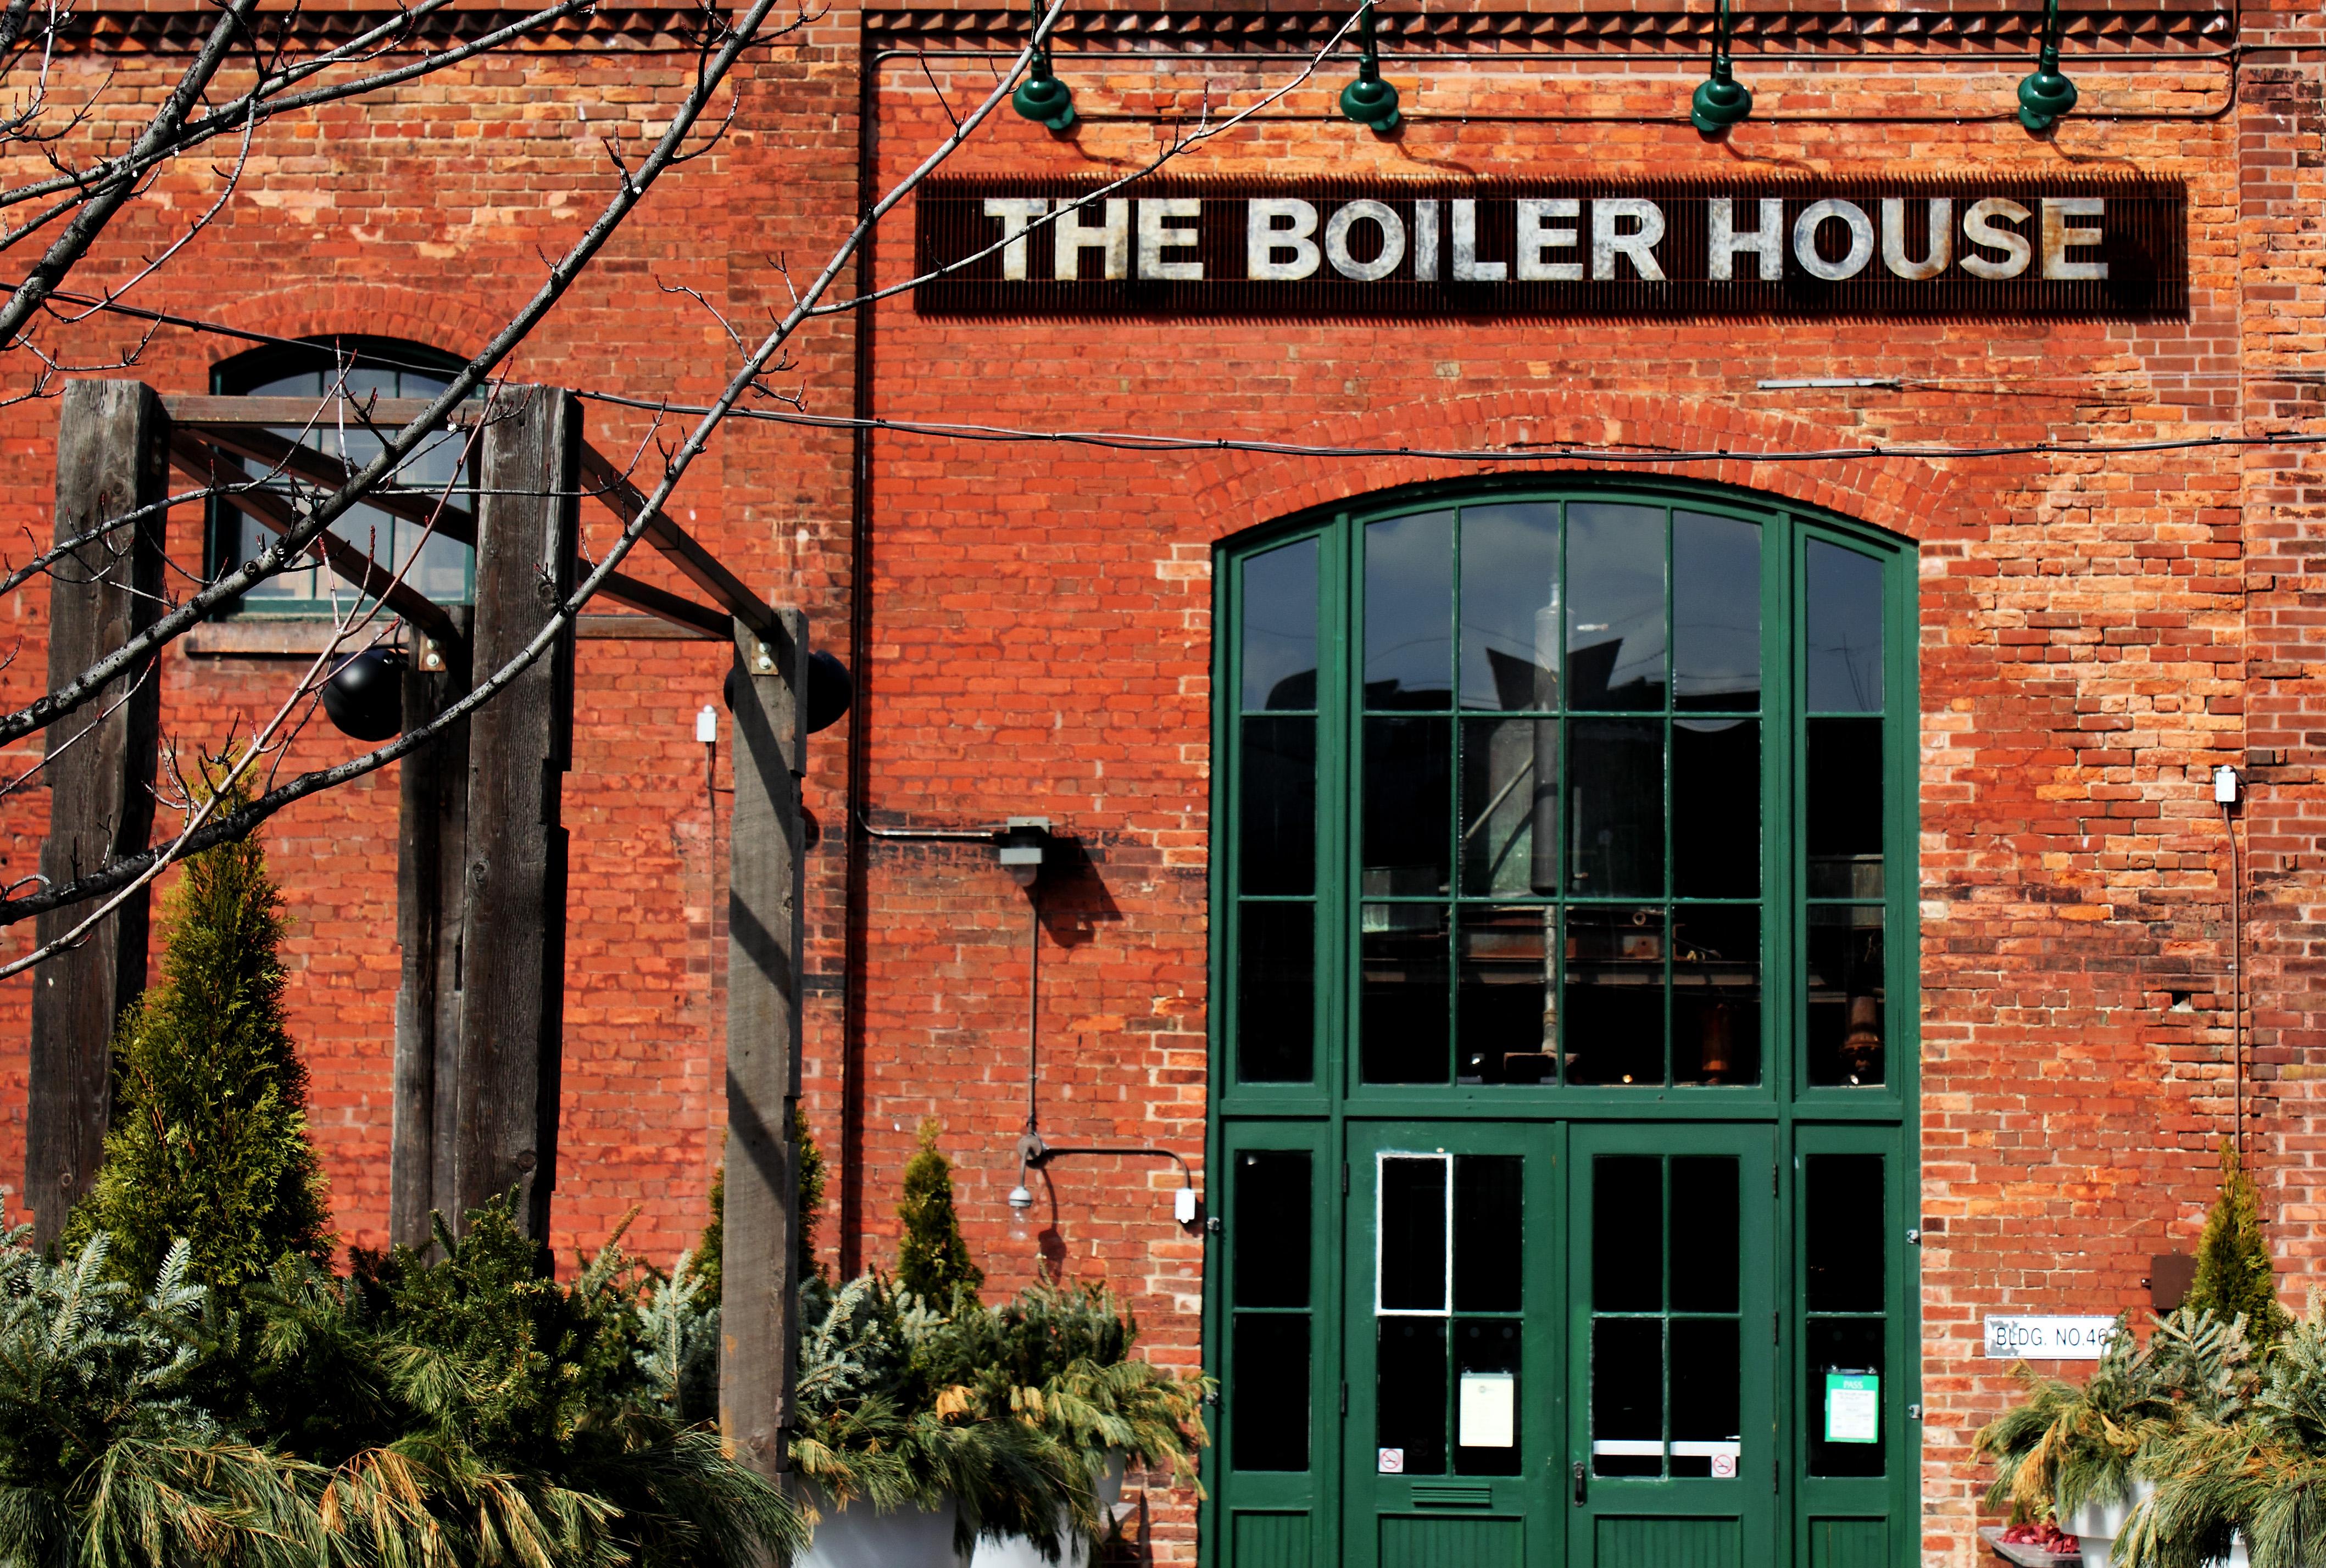 Boiler Room How To Get In